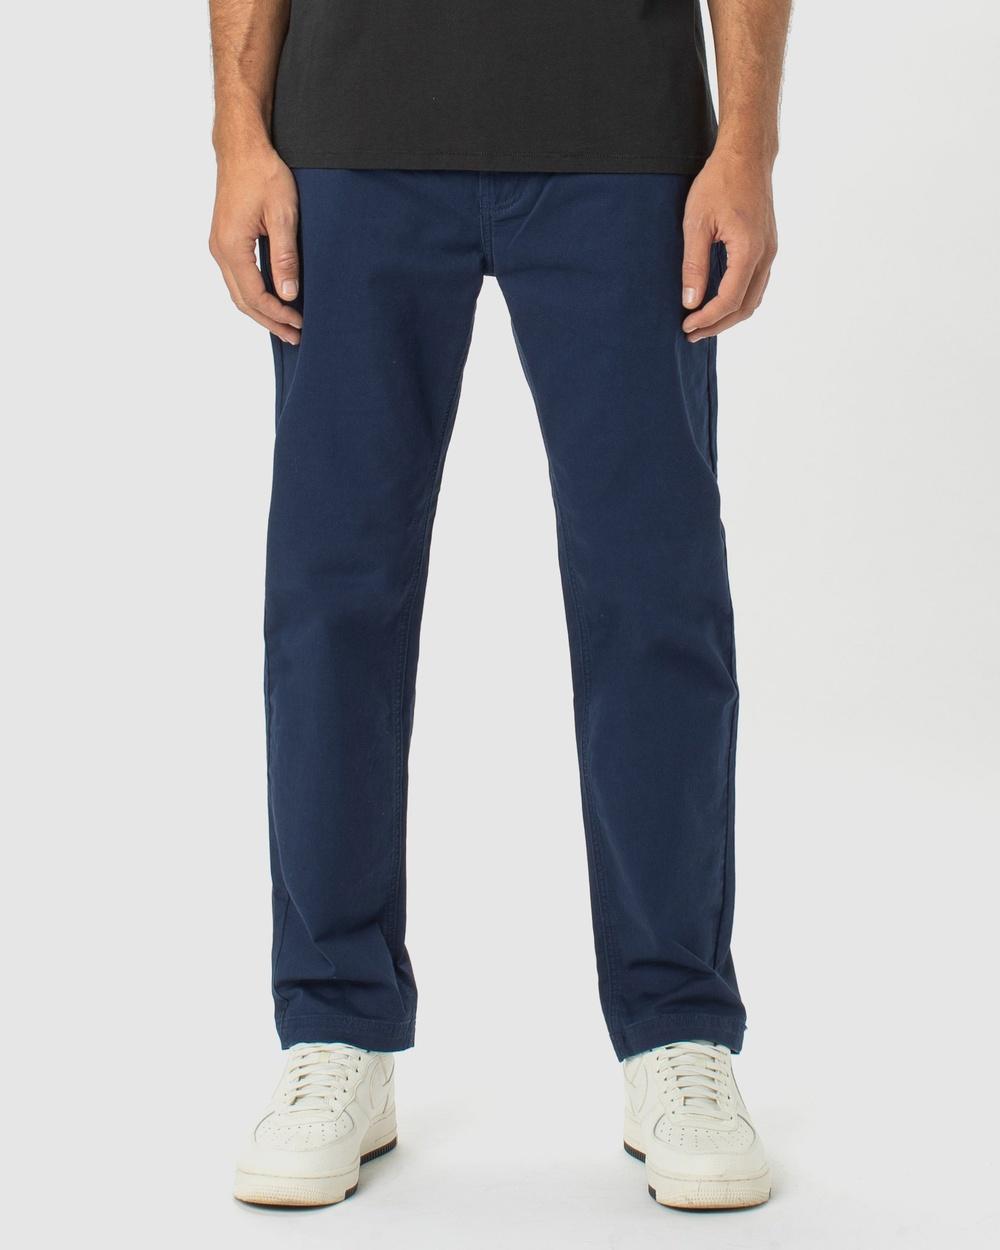 Barney Cools B.Relaxed Chino Pants Slate Australia